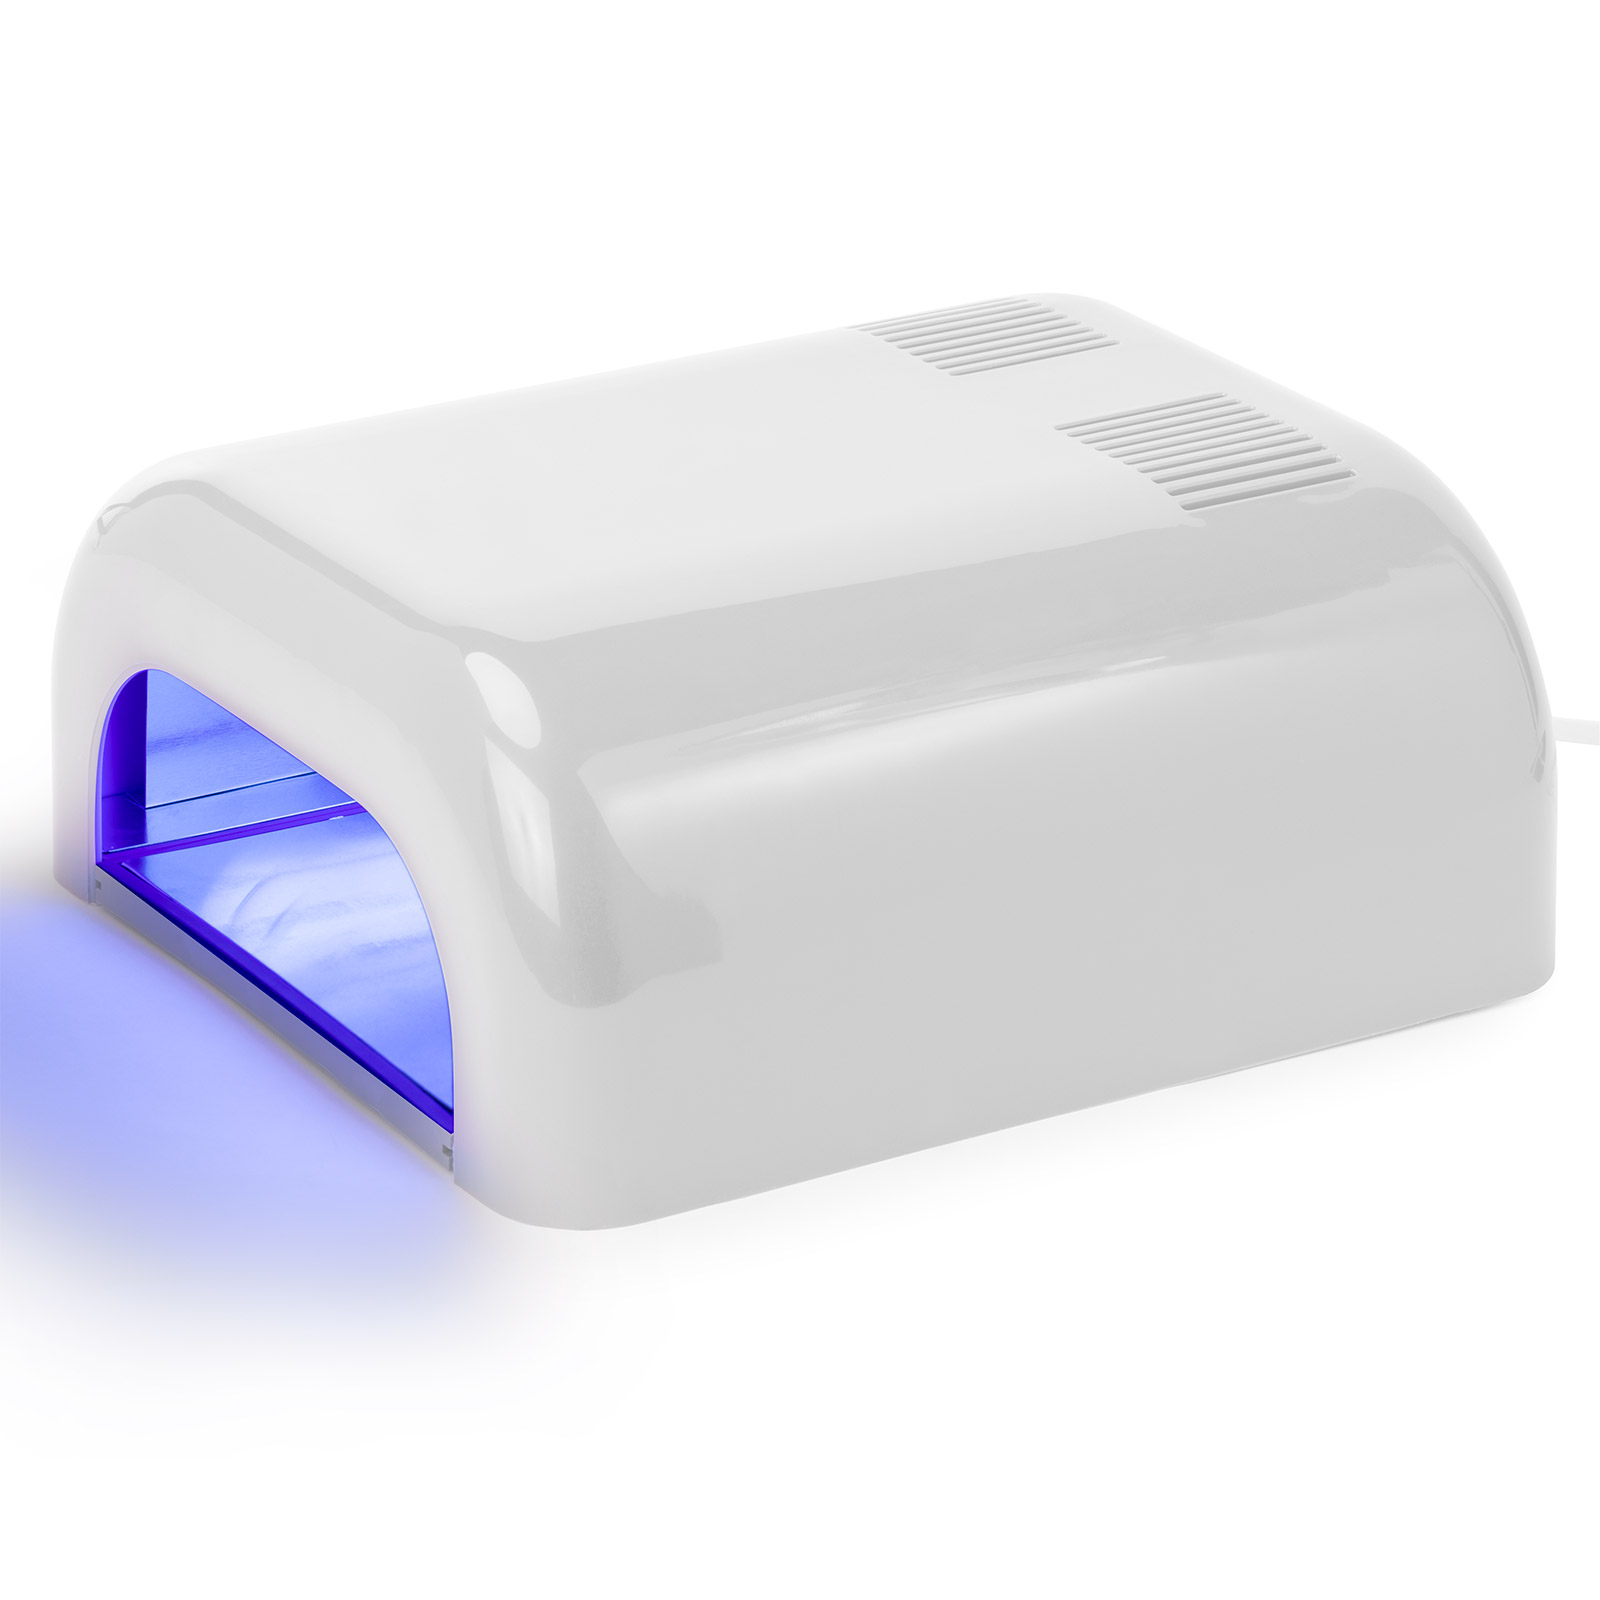 Nail Dryer Light: Gel Polish Manicure Curing